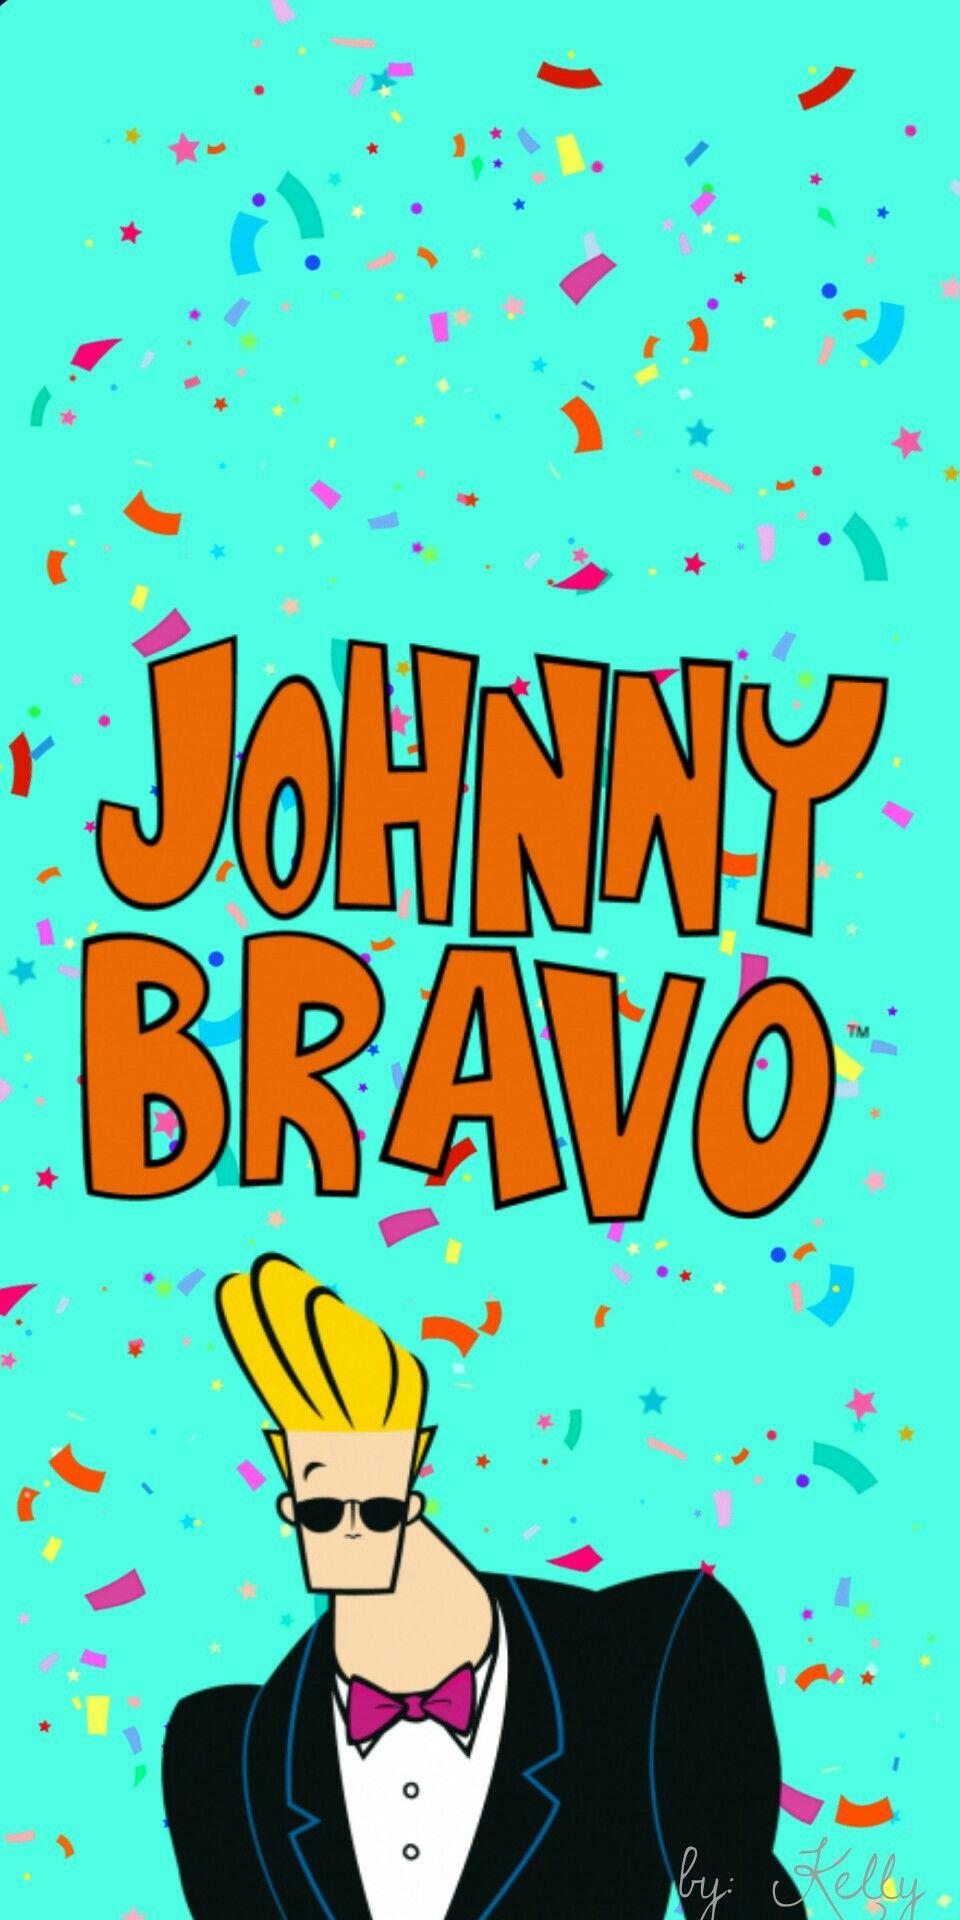 Johnny Bravo Johnny Bravo Cartoon Wallpaper Jhonny Bravo